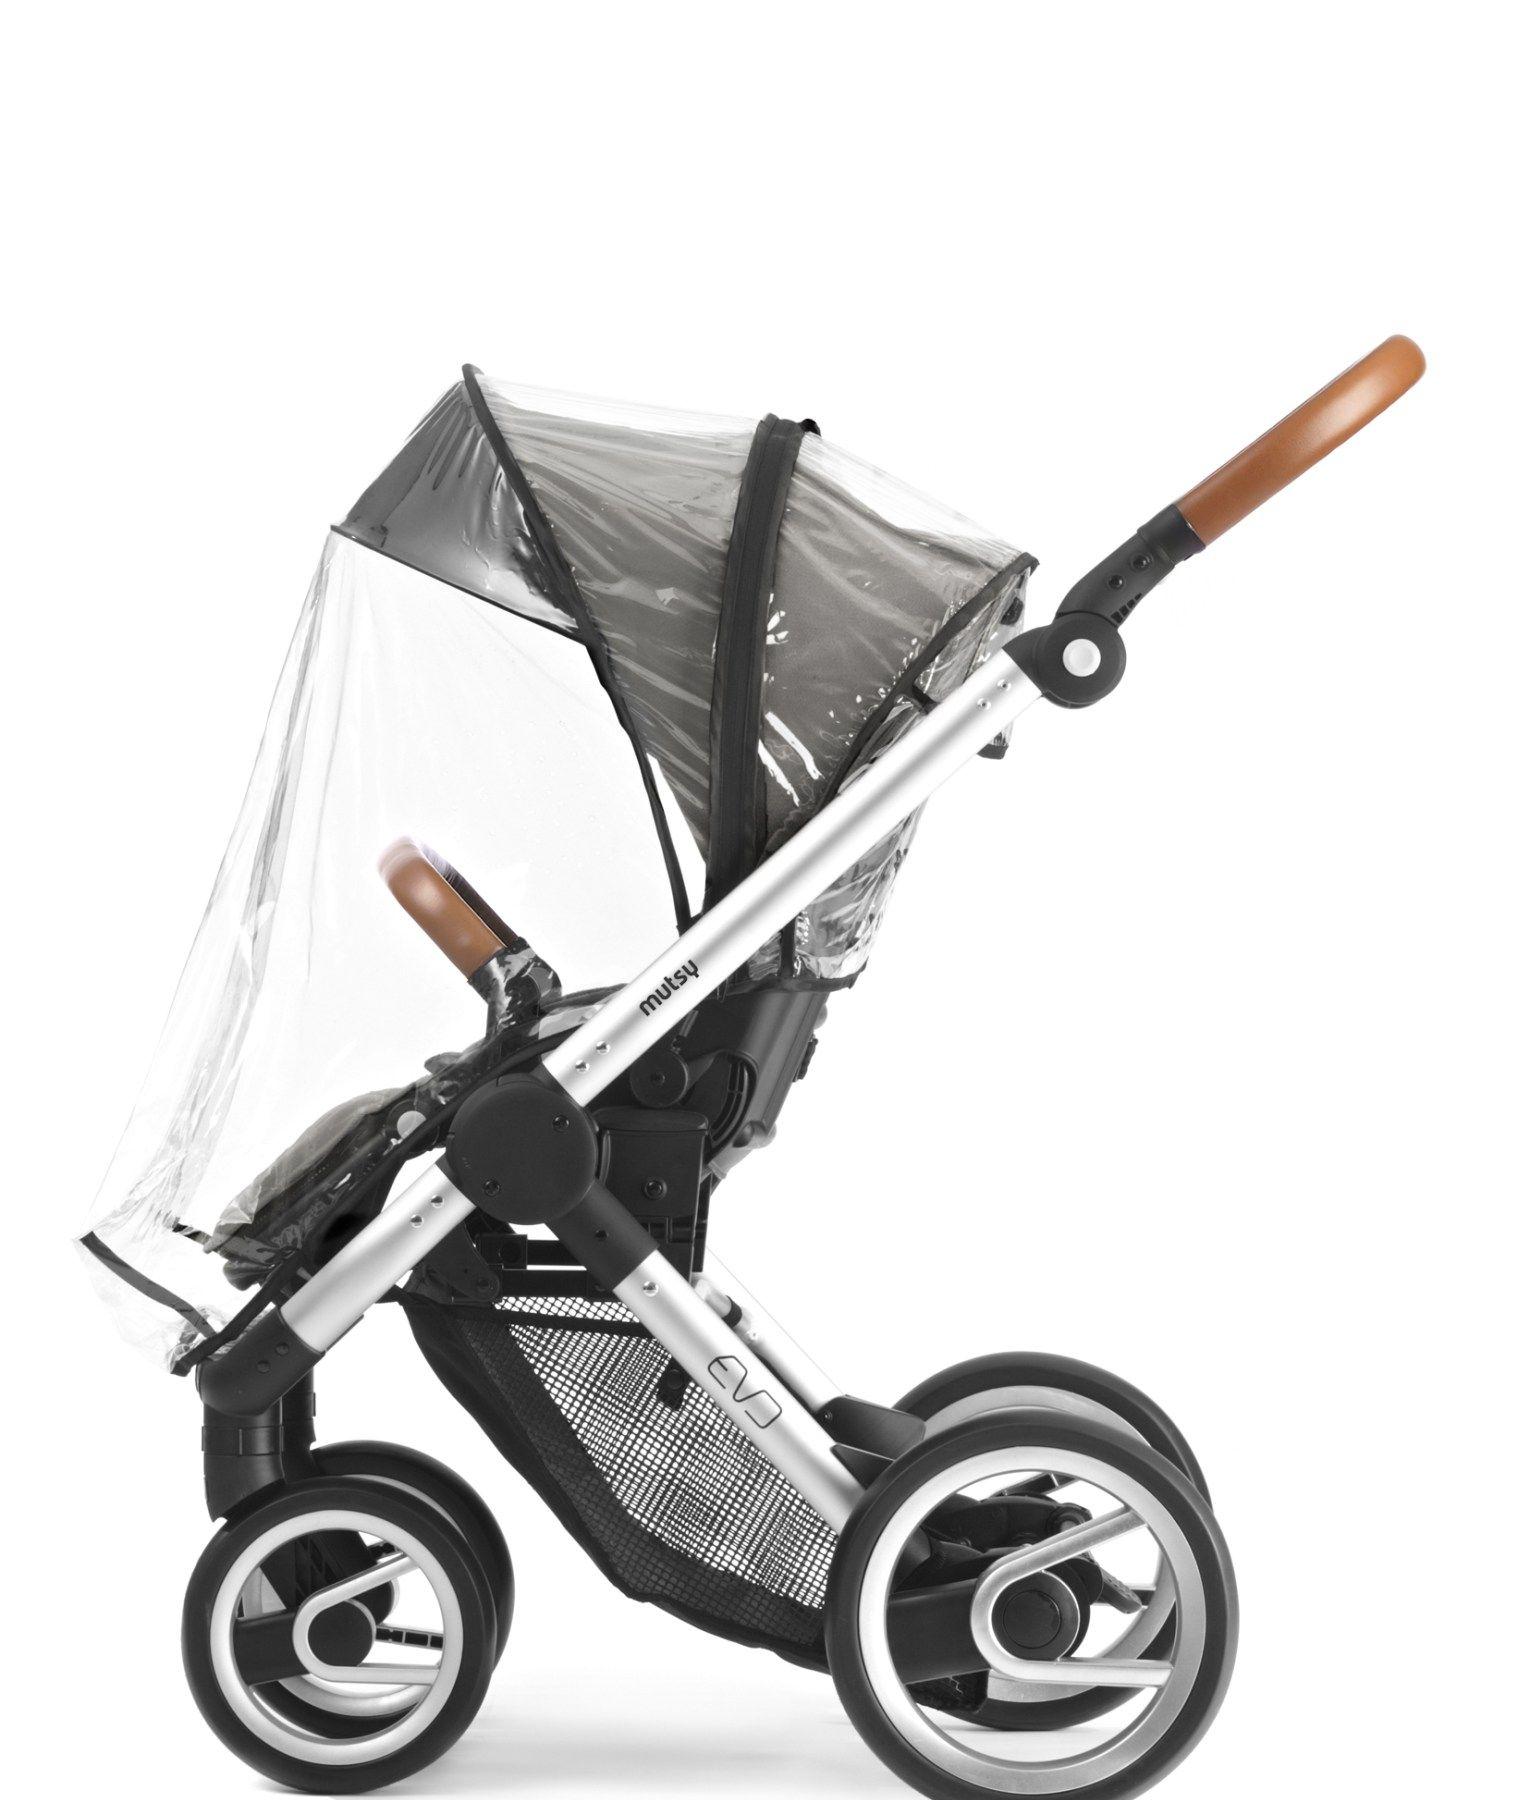 Mutsy Evo Seat Rain Cover Urban stroller, Baby prams